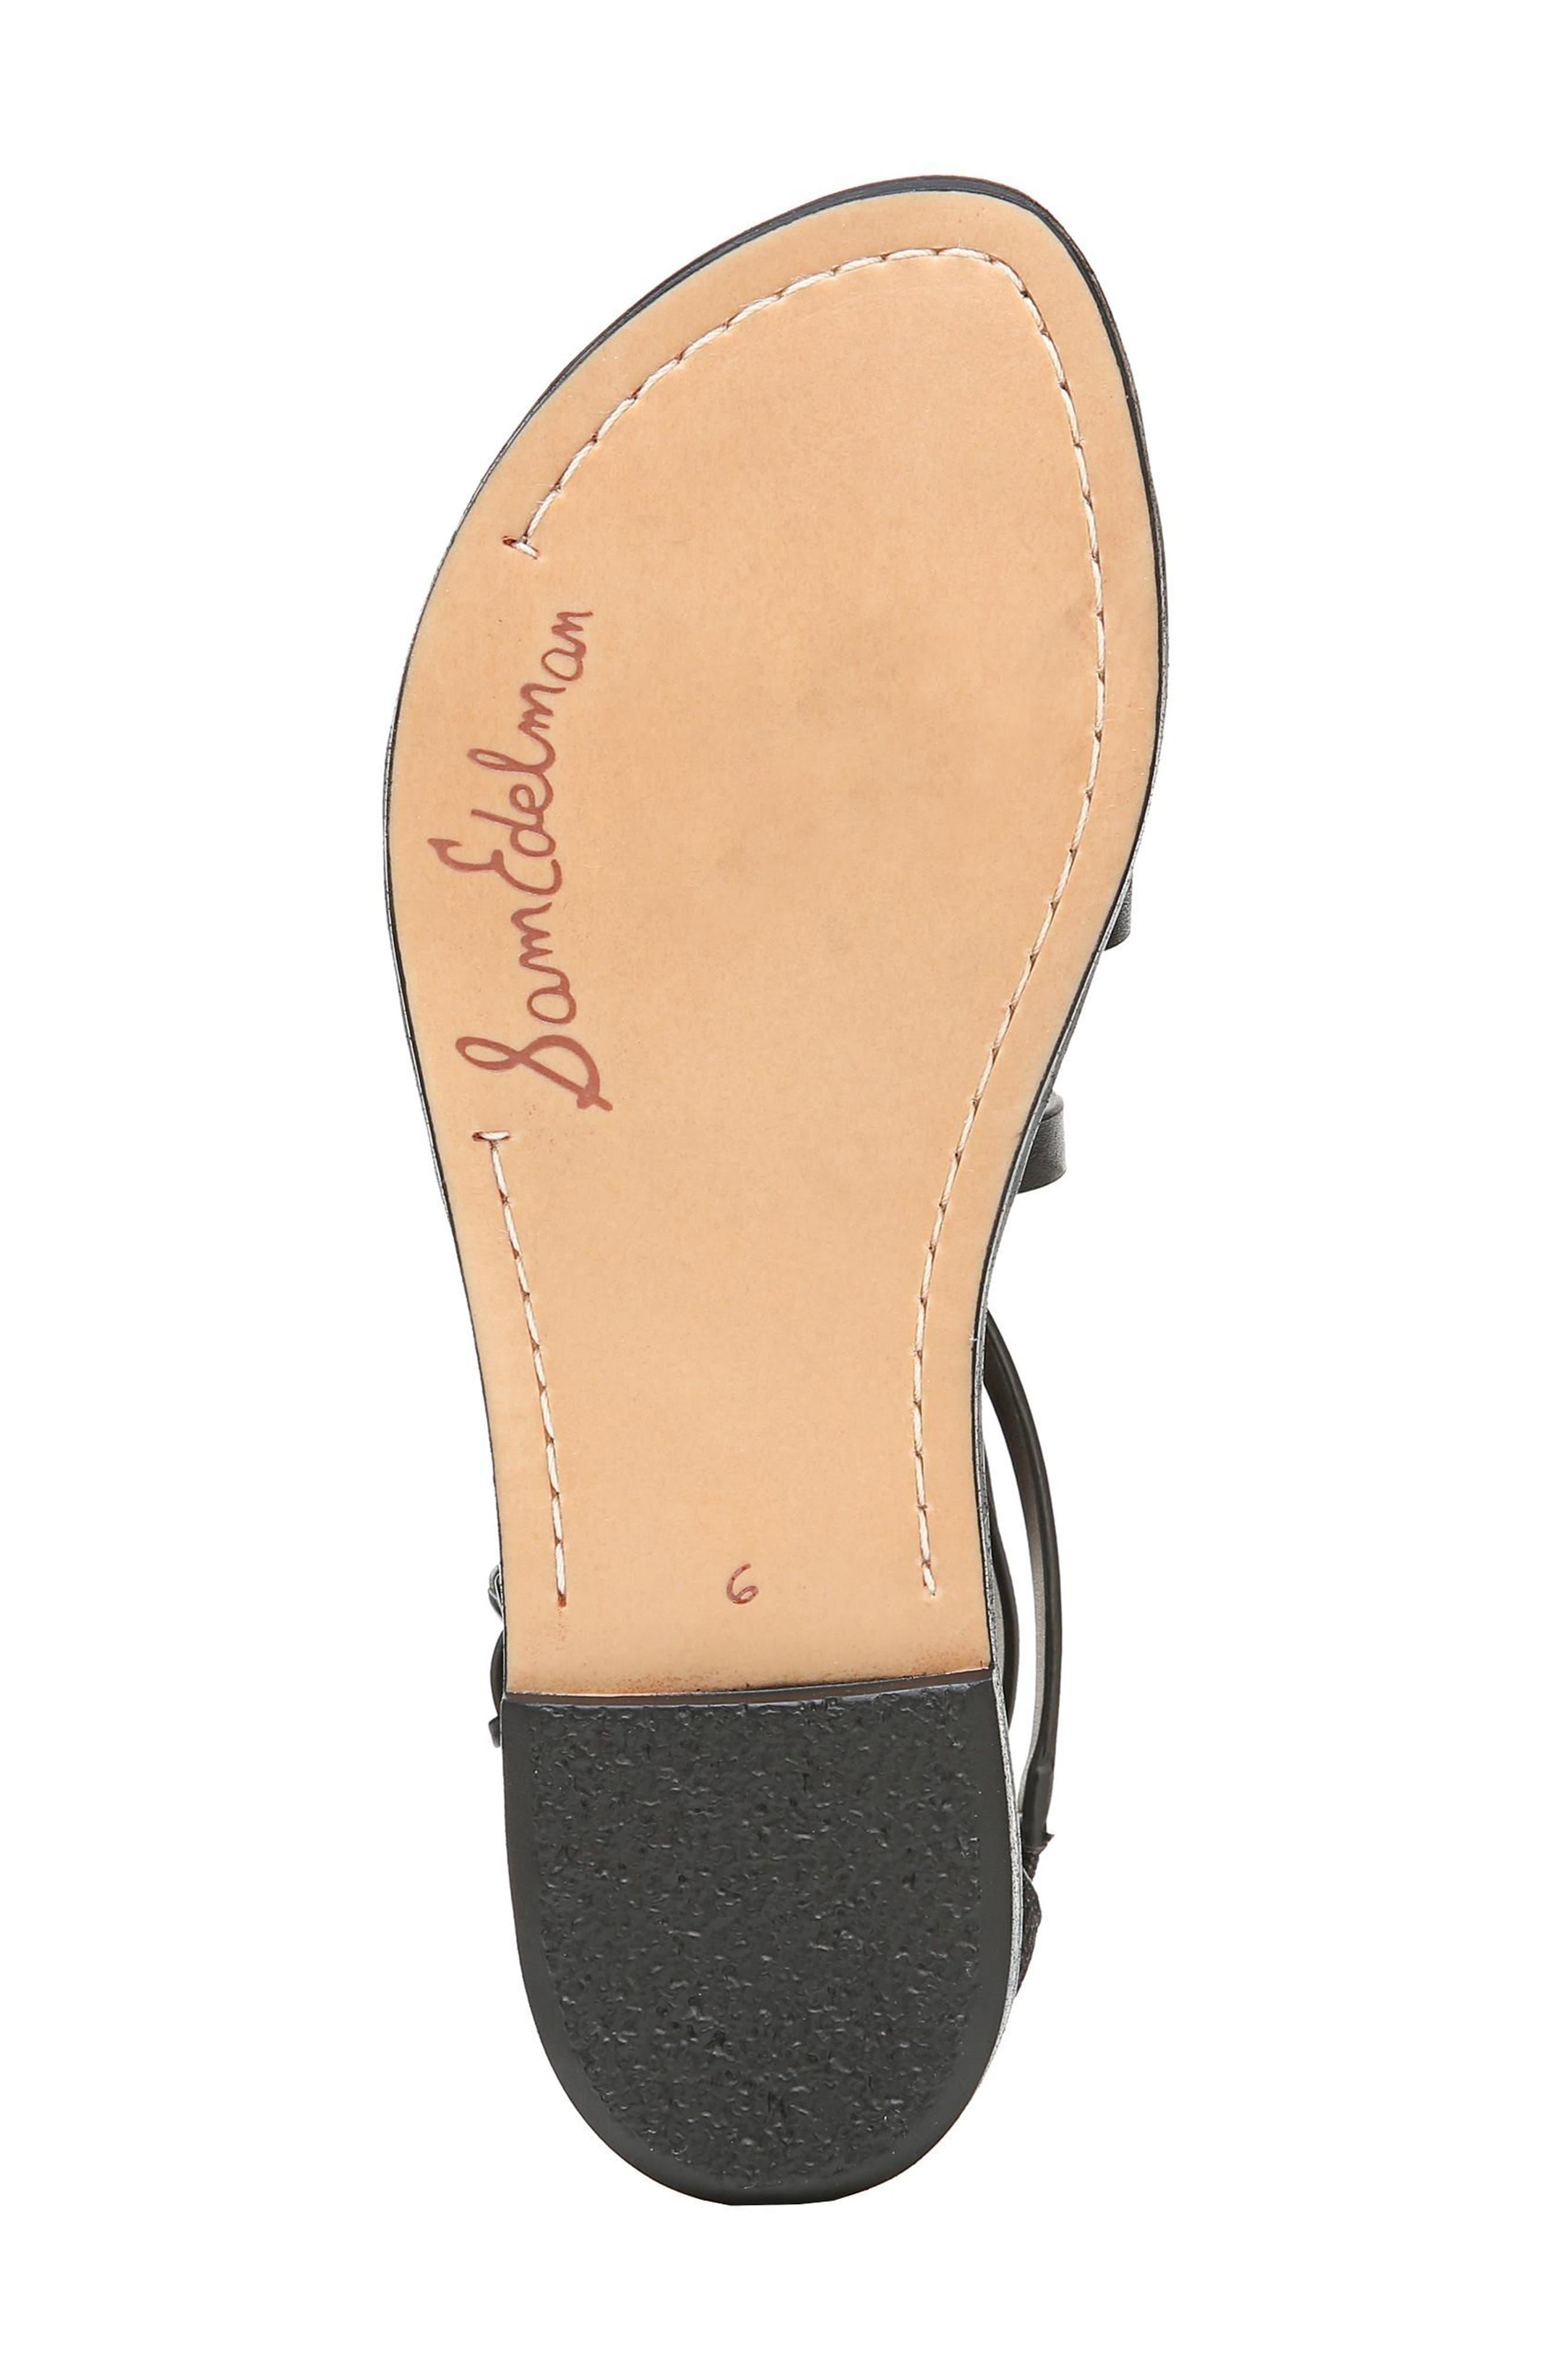 Ganesa Strappy Sandal,                             Alternate thumbnail 6, color,                             BLACK LEATHER